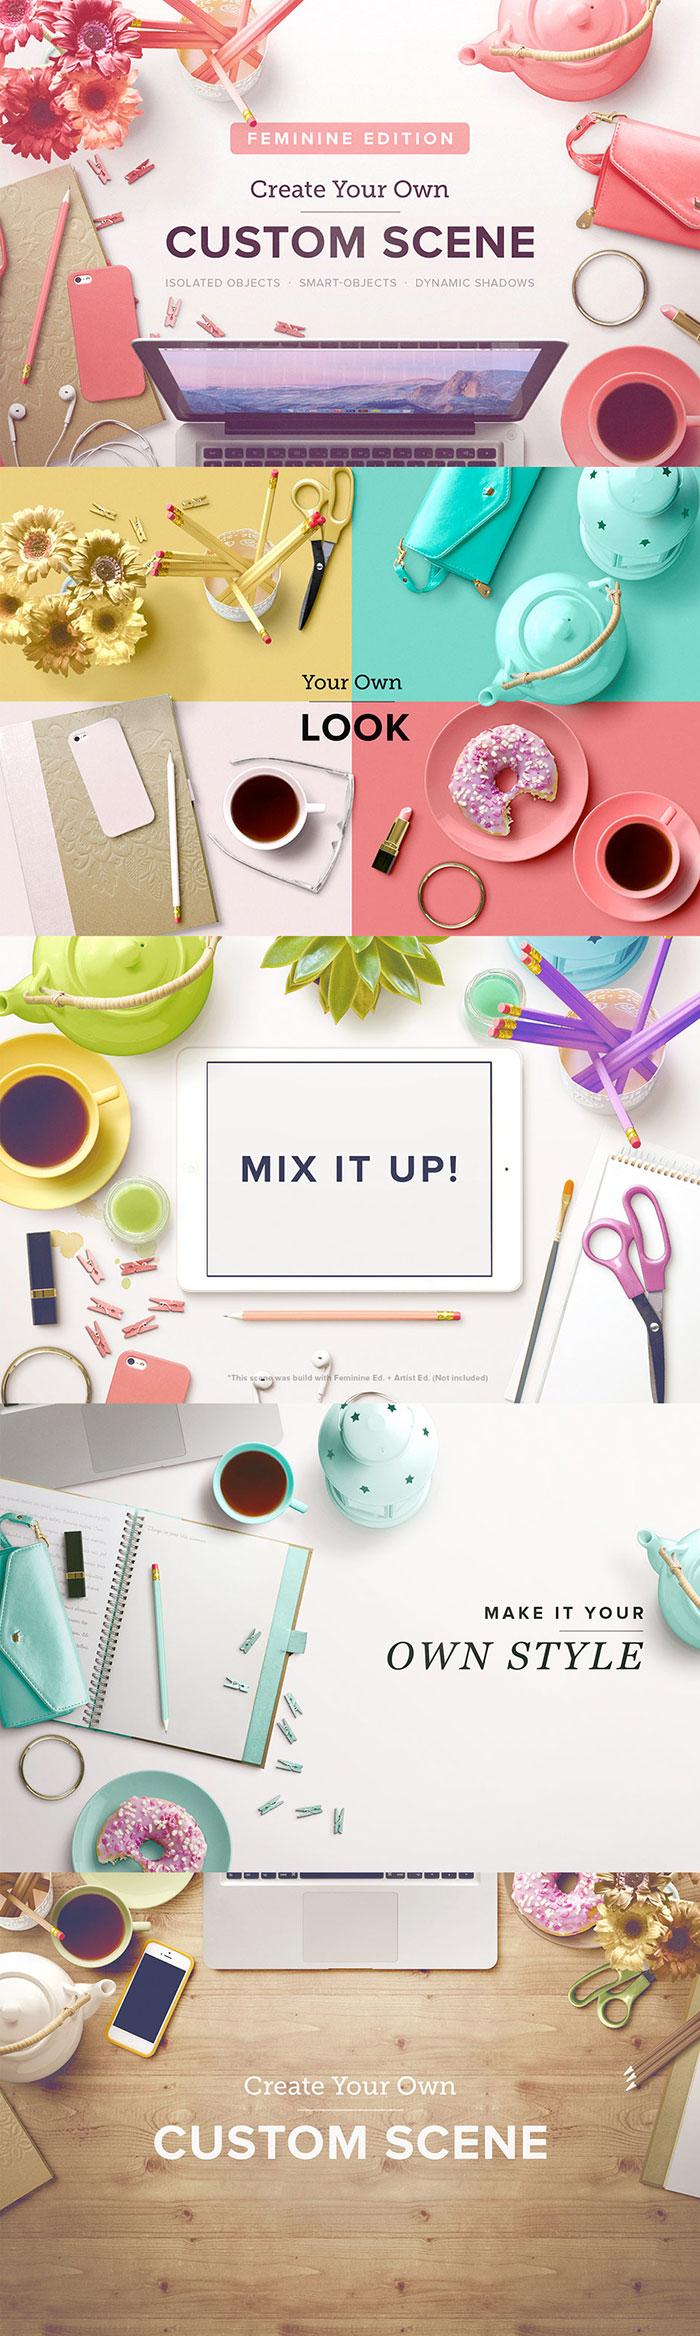 Custom Scene Generator - Styled Desktops – Feminine Ed. – Vol. 1  from Roman Jusdado. The Beautifully Artistic Designer's Kit (1000s of Creative Resources) for just $29